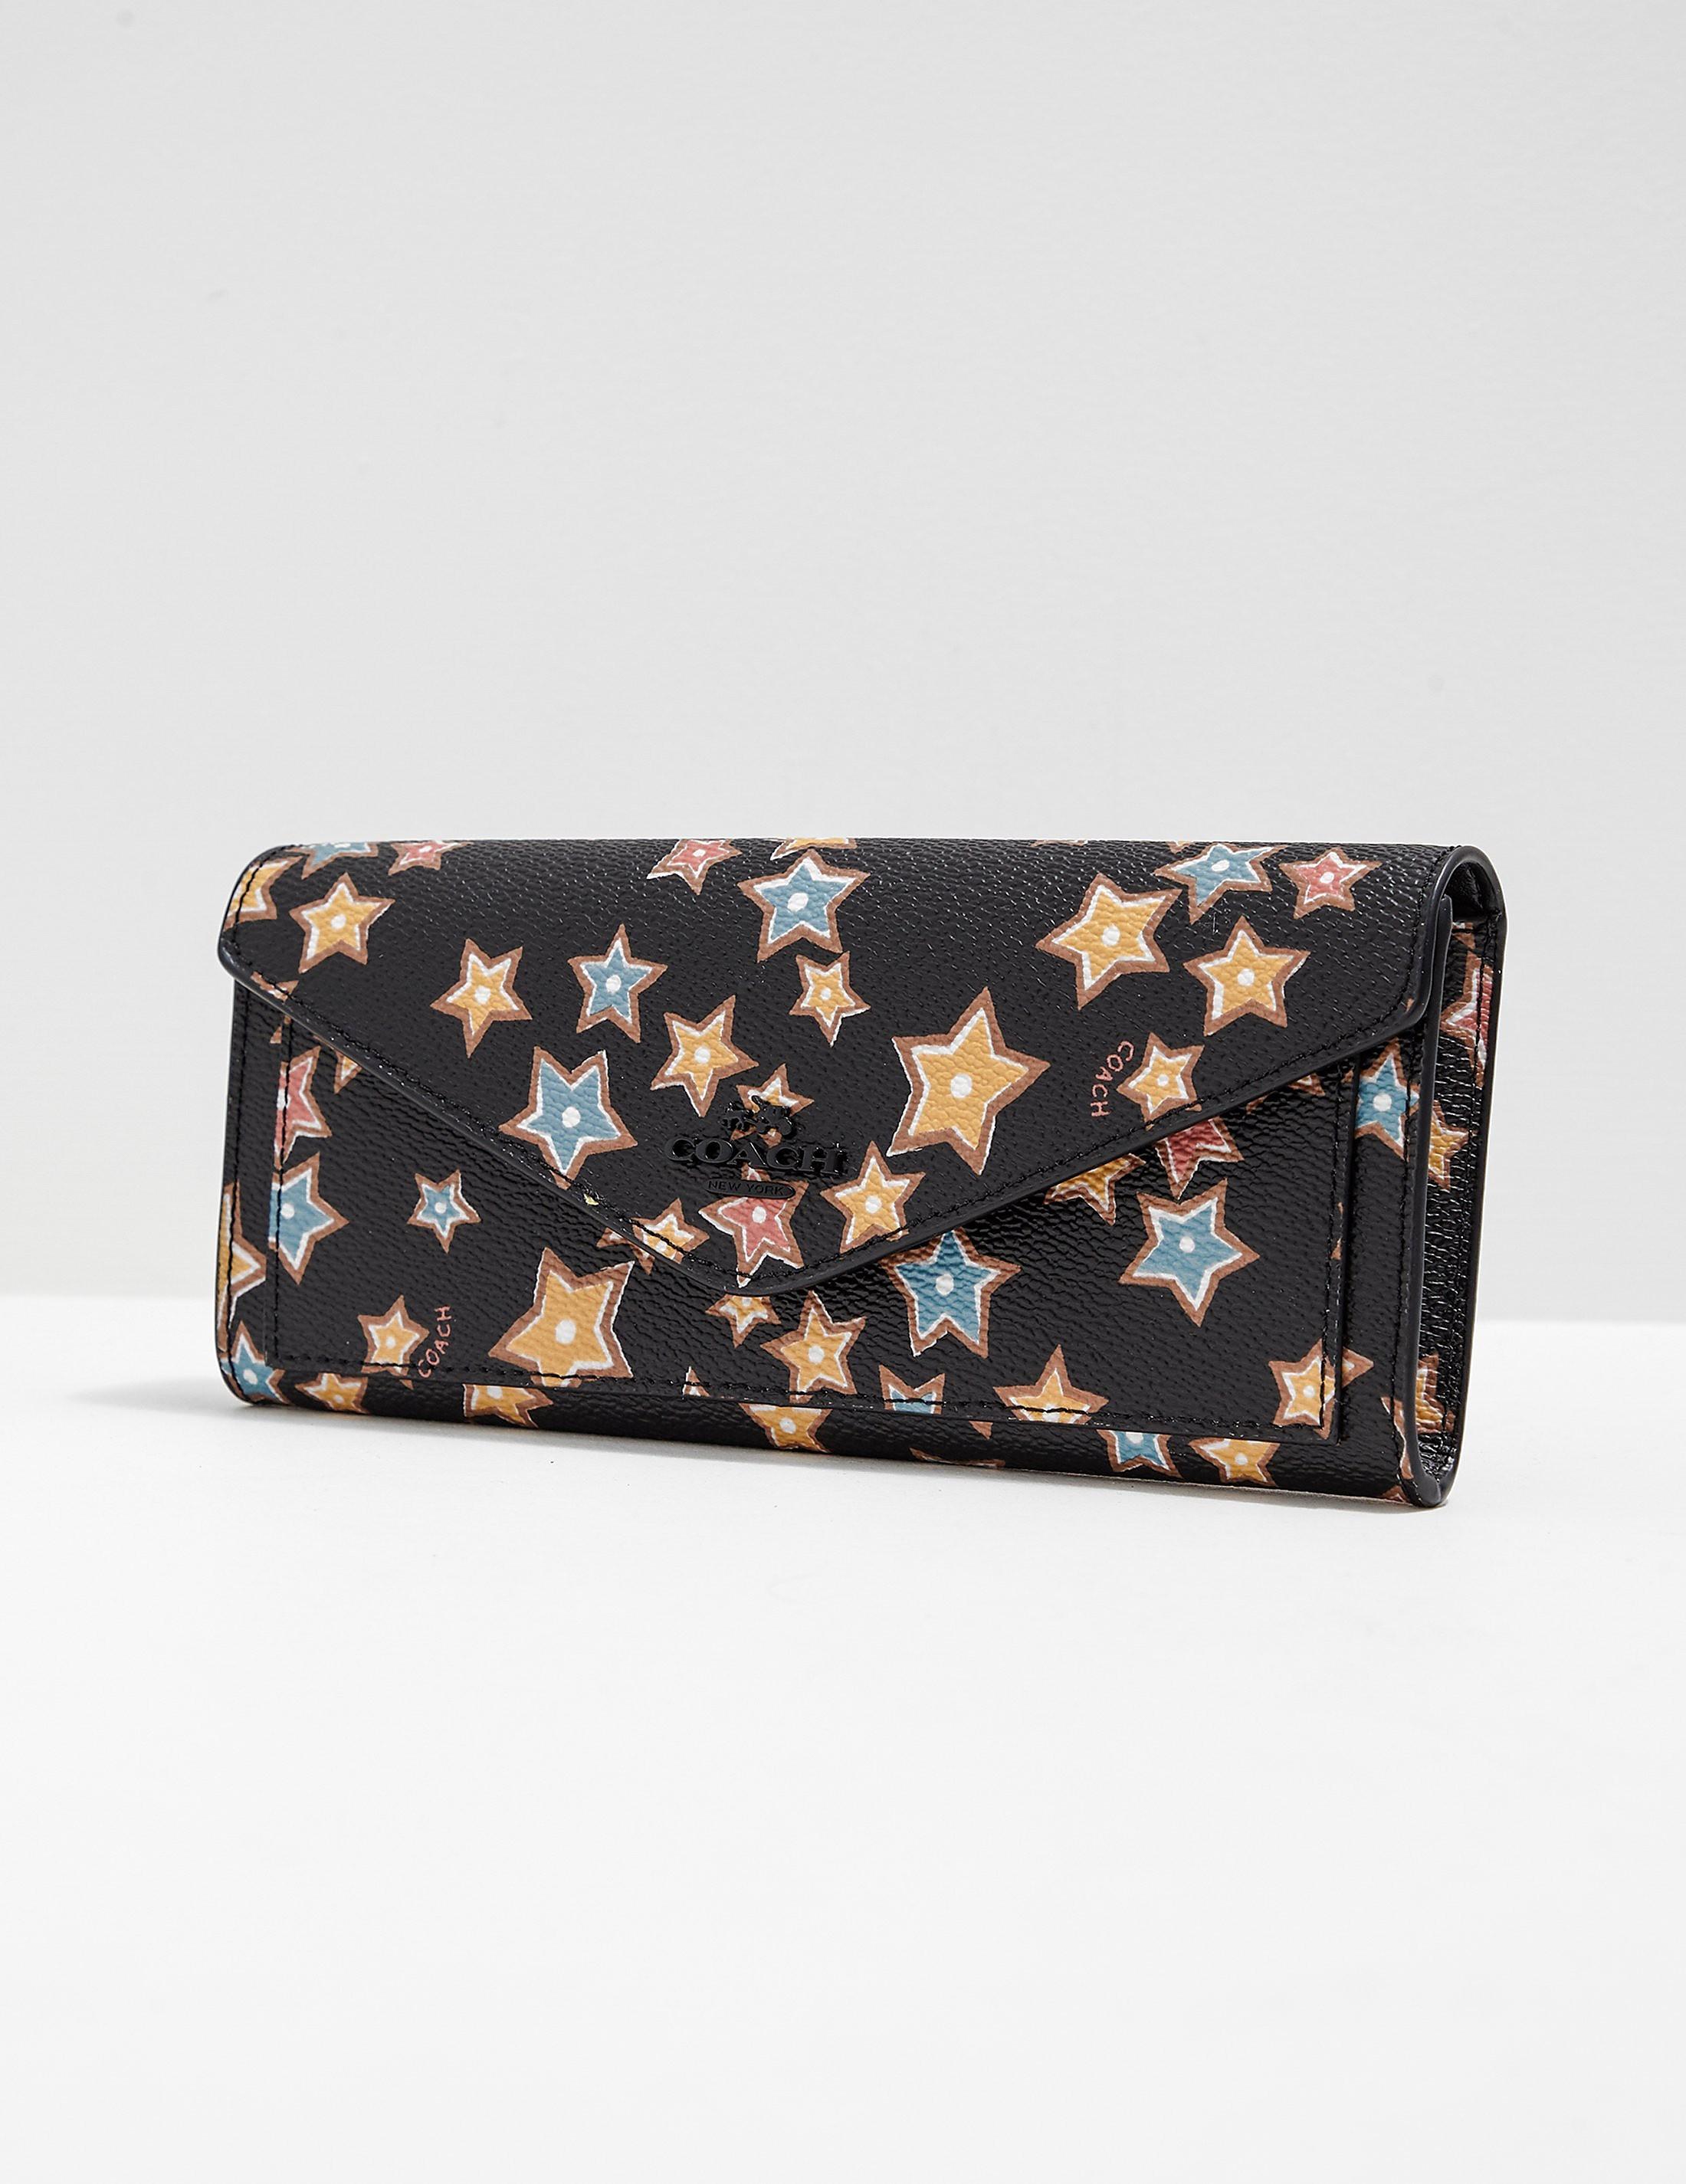 COACH Star Wallet